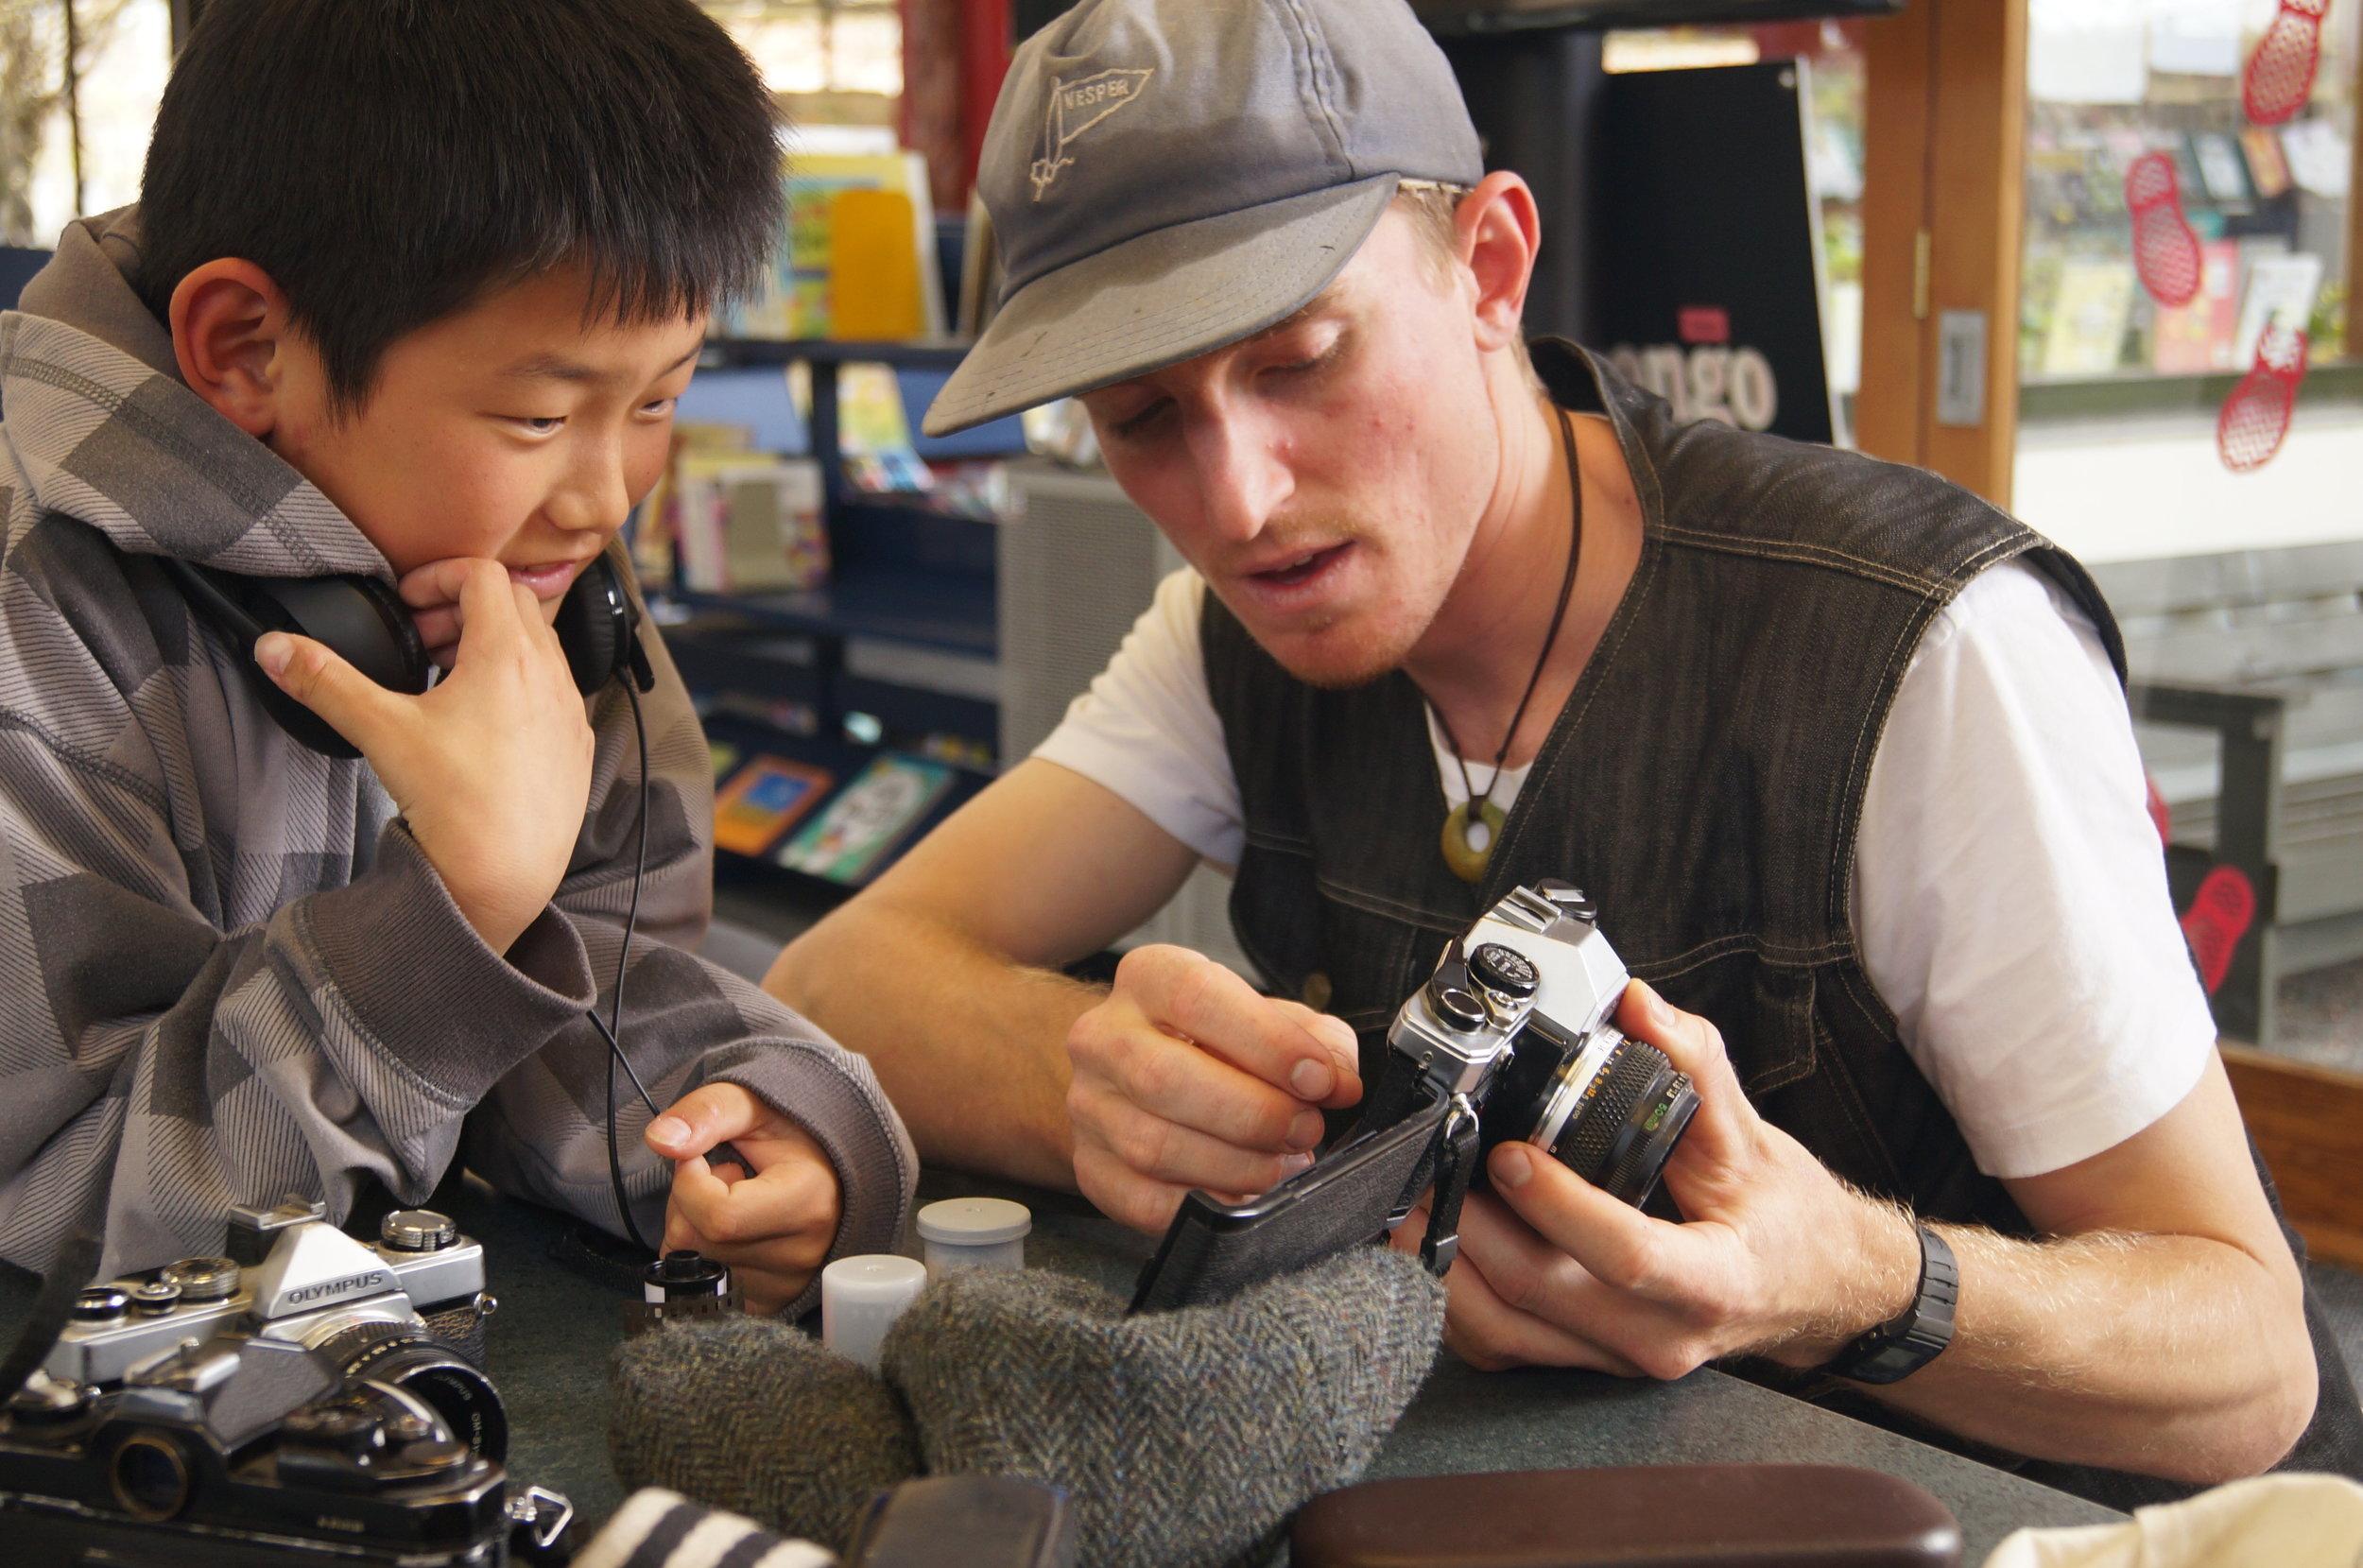 Nortchote photography workshop